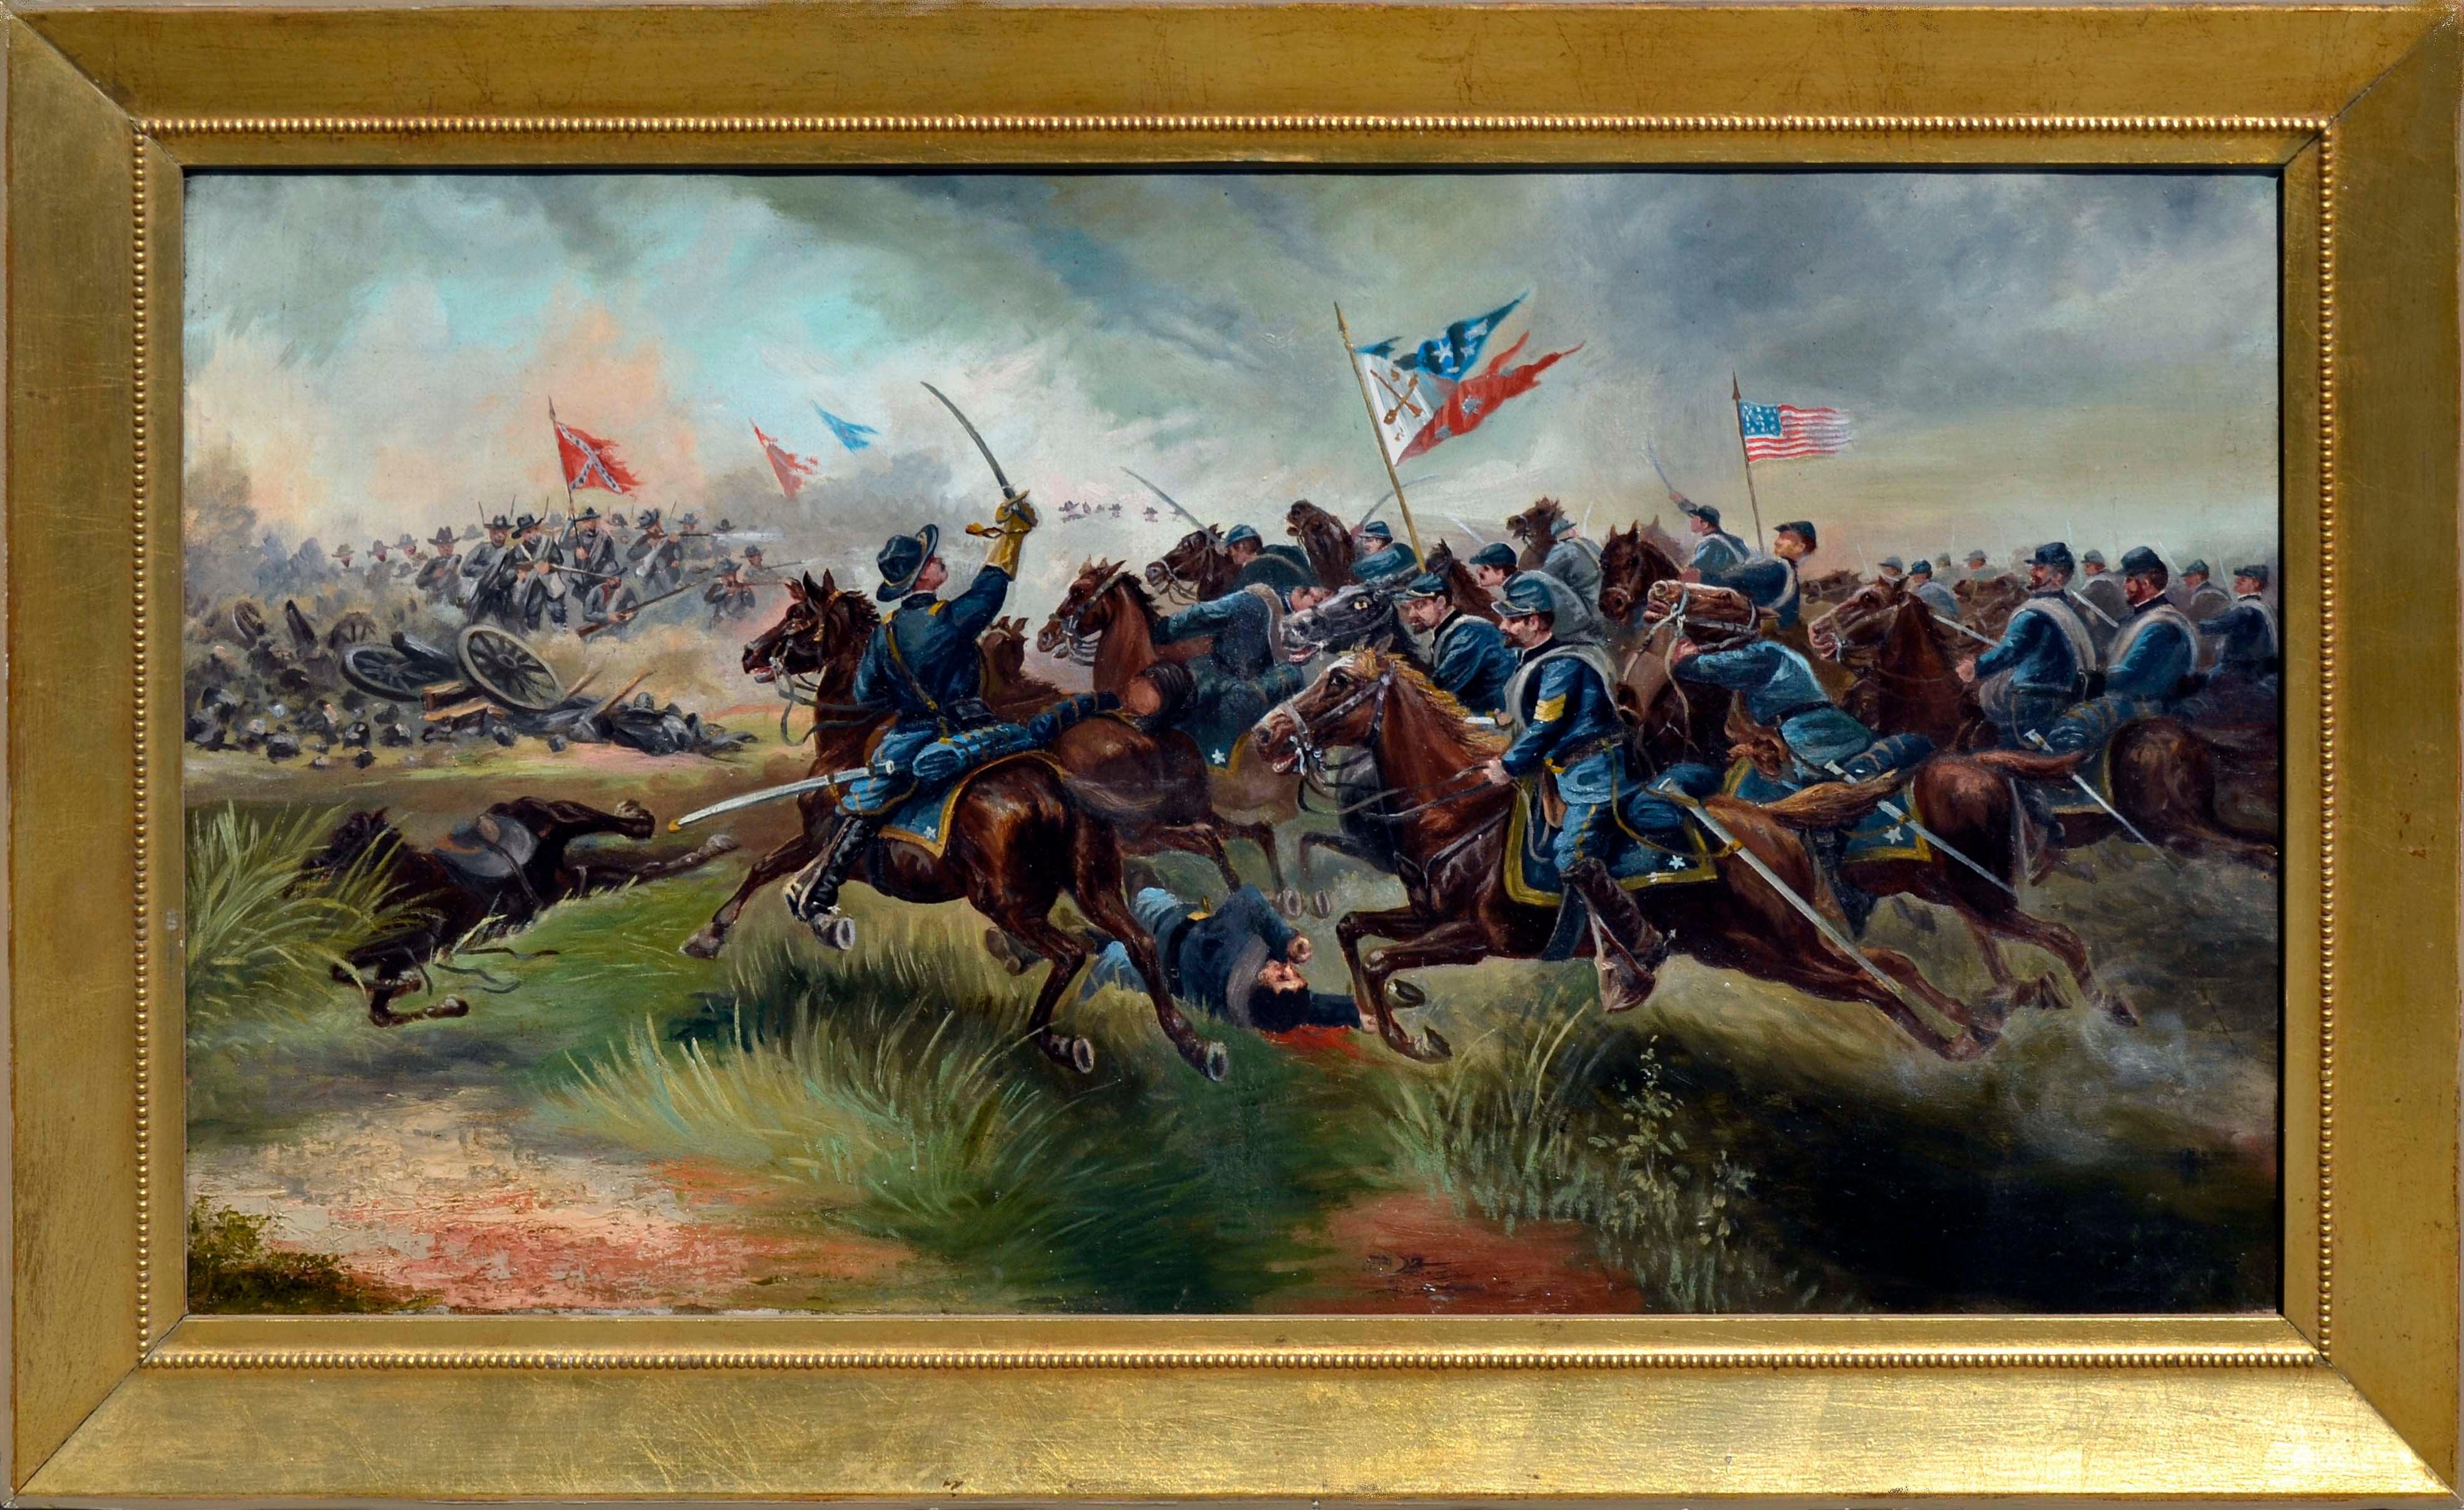 Sackett's Calvary Charge of the 9th New York Volunteers - Late 19th Century